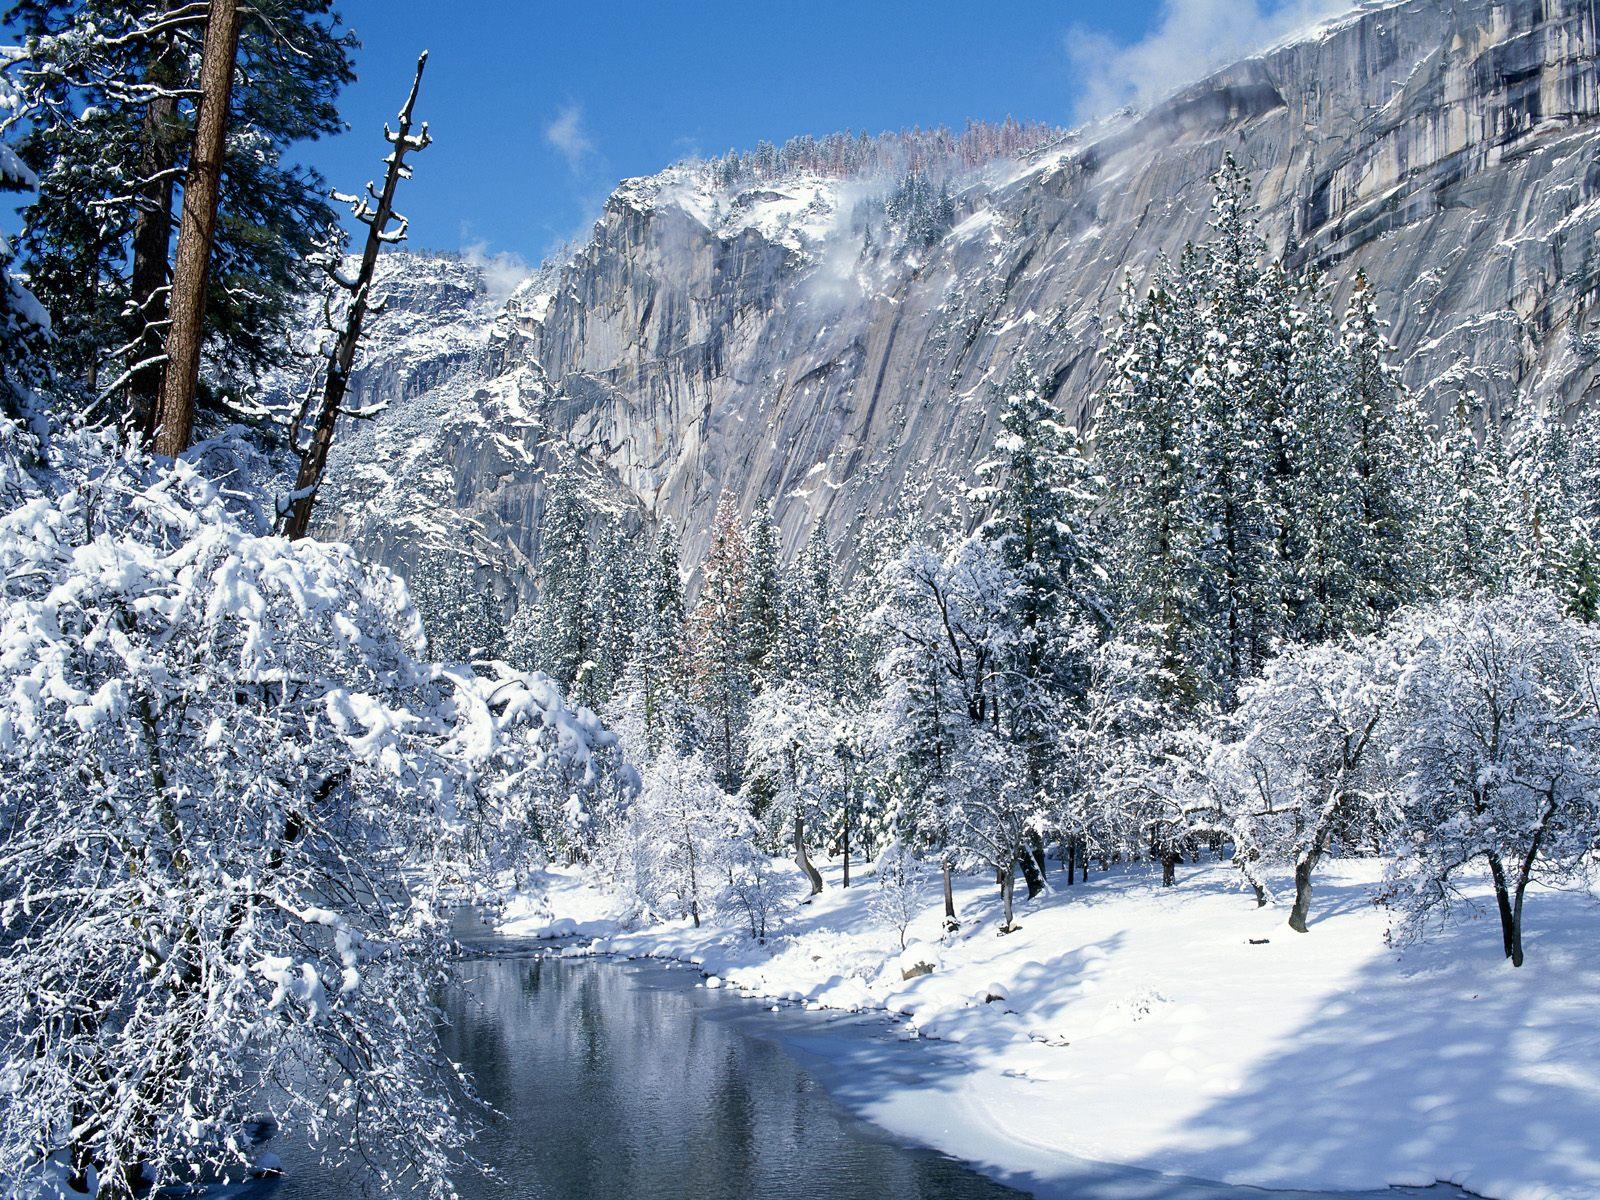 Wallpaper Proslut: Ice Snowy Mountains Free Wallpapers HD